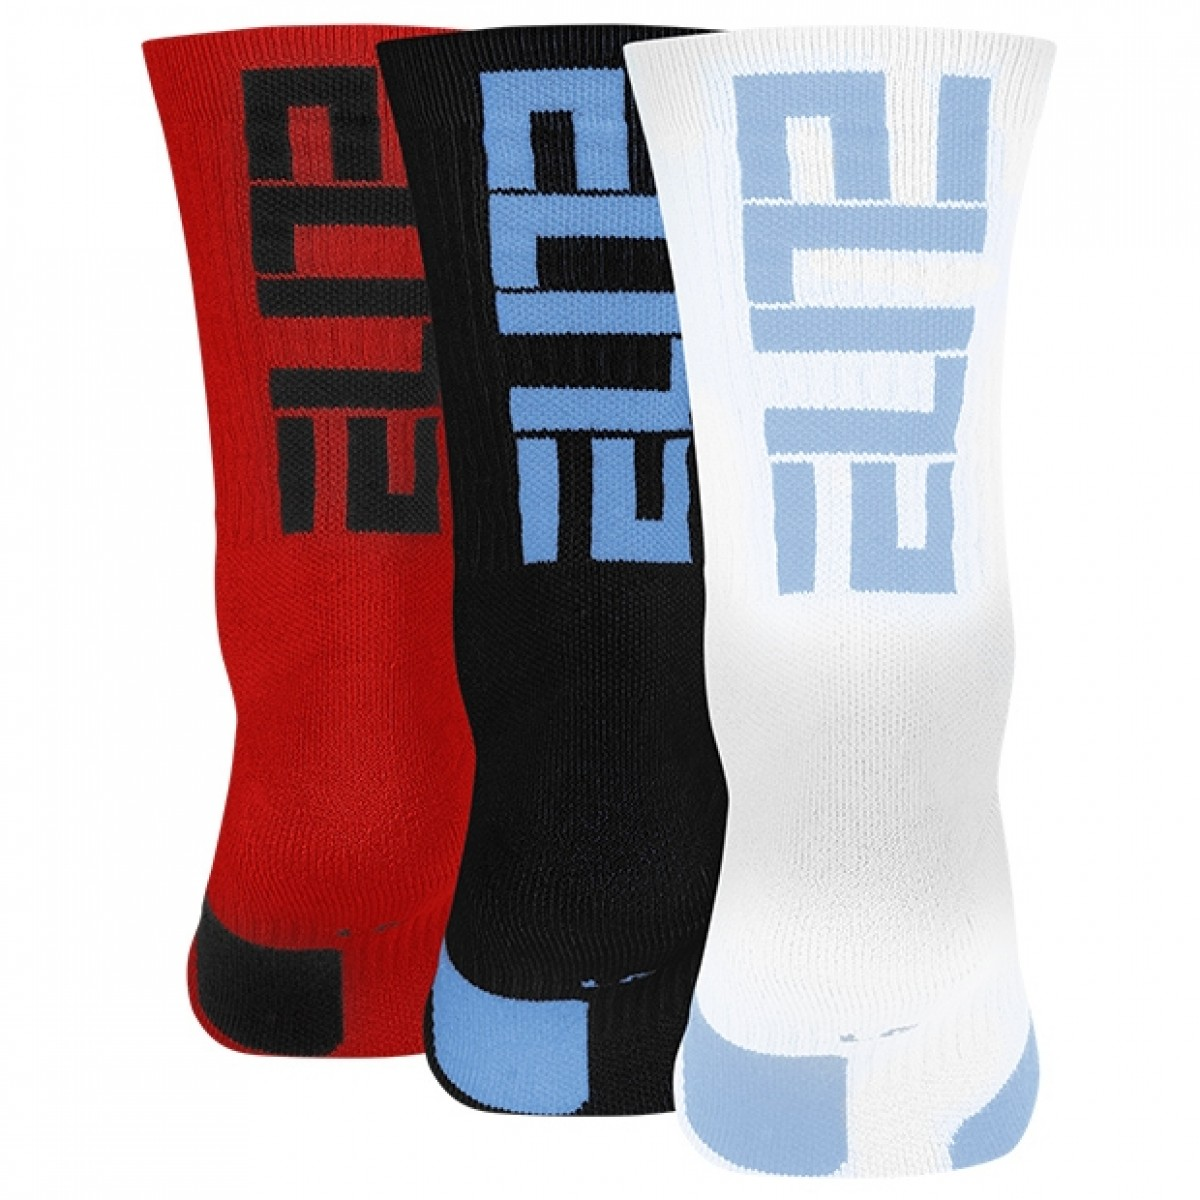 Nike Elite Crew 3 Pack Socks 'Multi'-SX7627-966